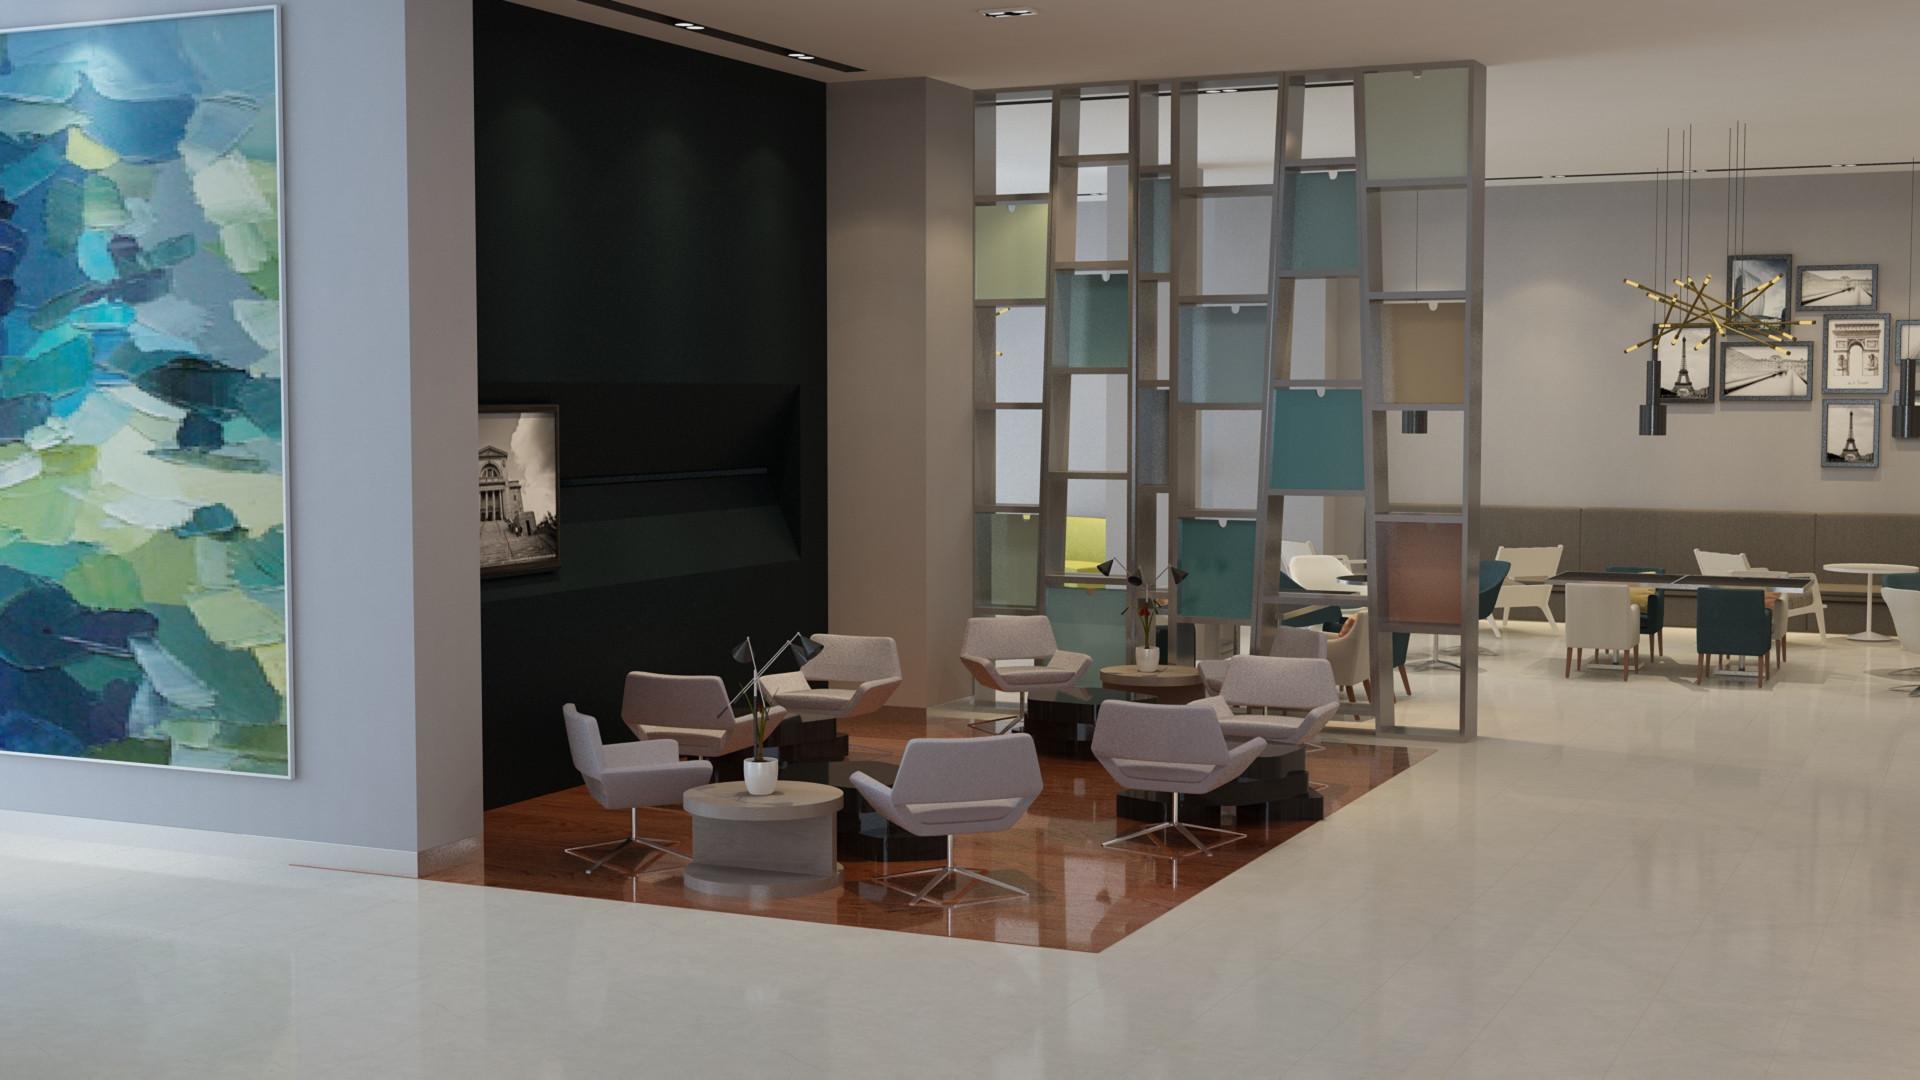 Cafe Interior Visualization